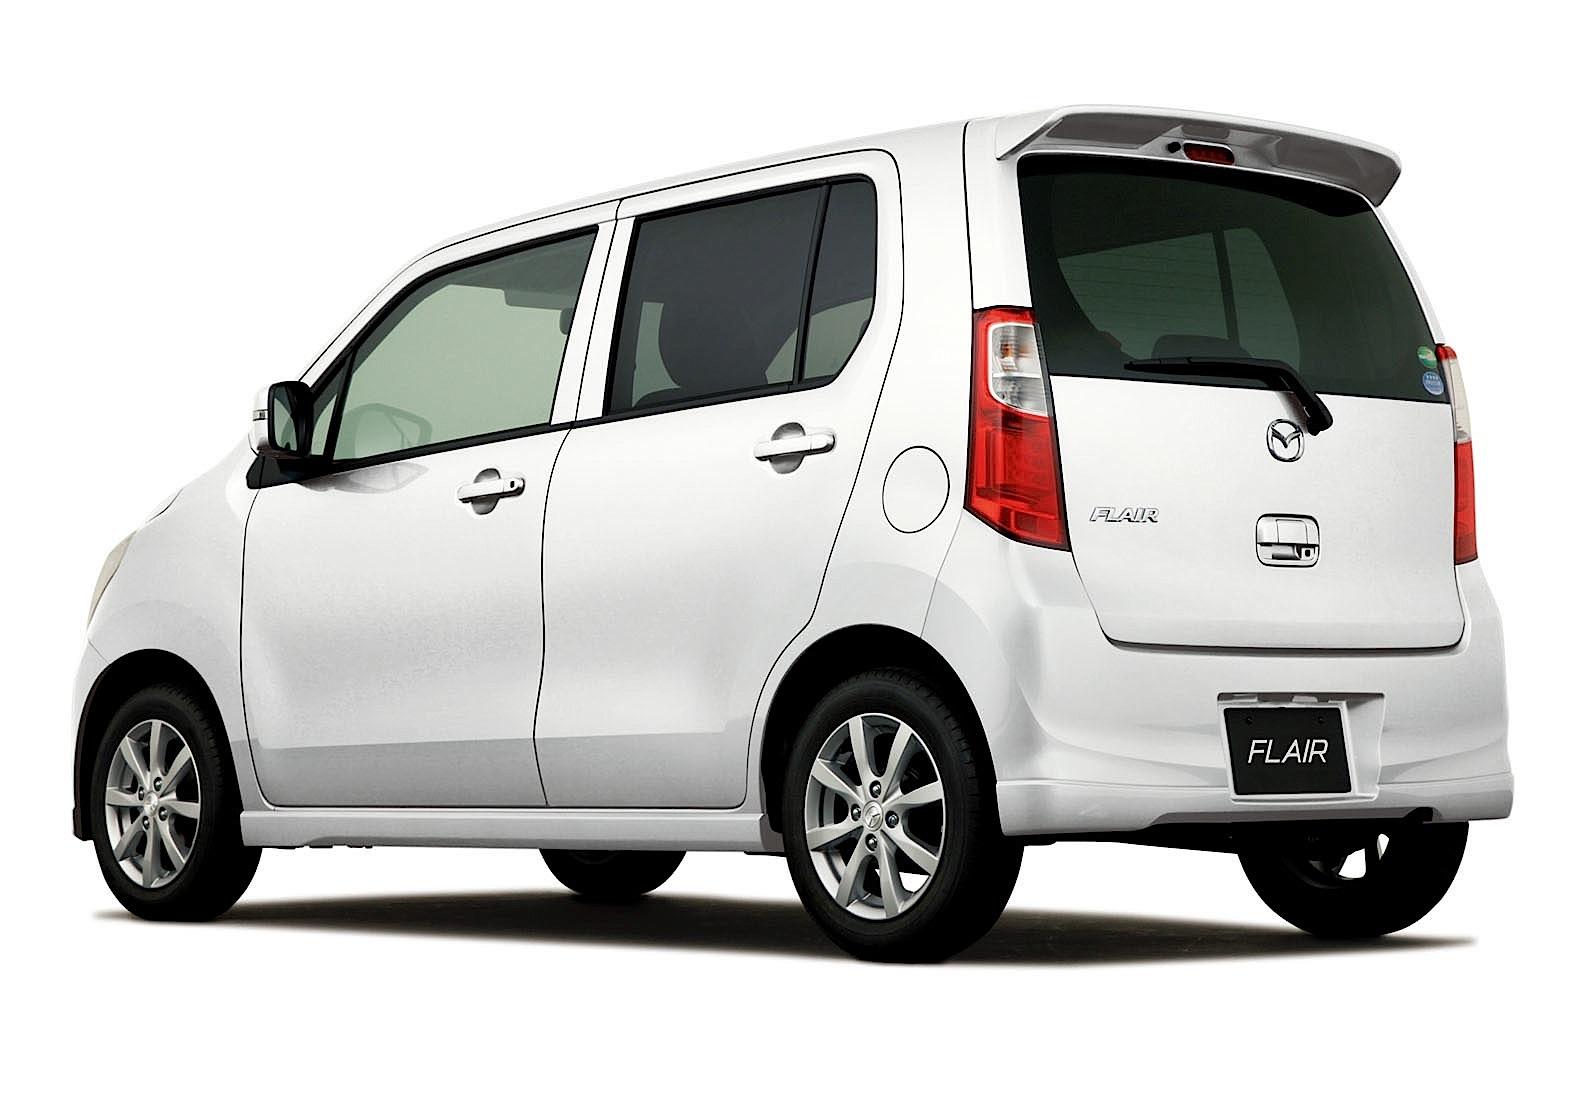 Mazda Flair I 2012 - 2014 Microvan #3